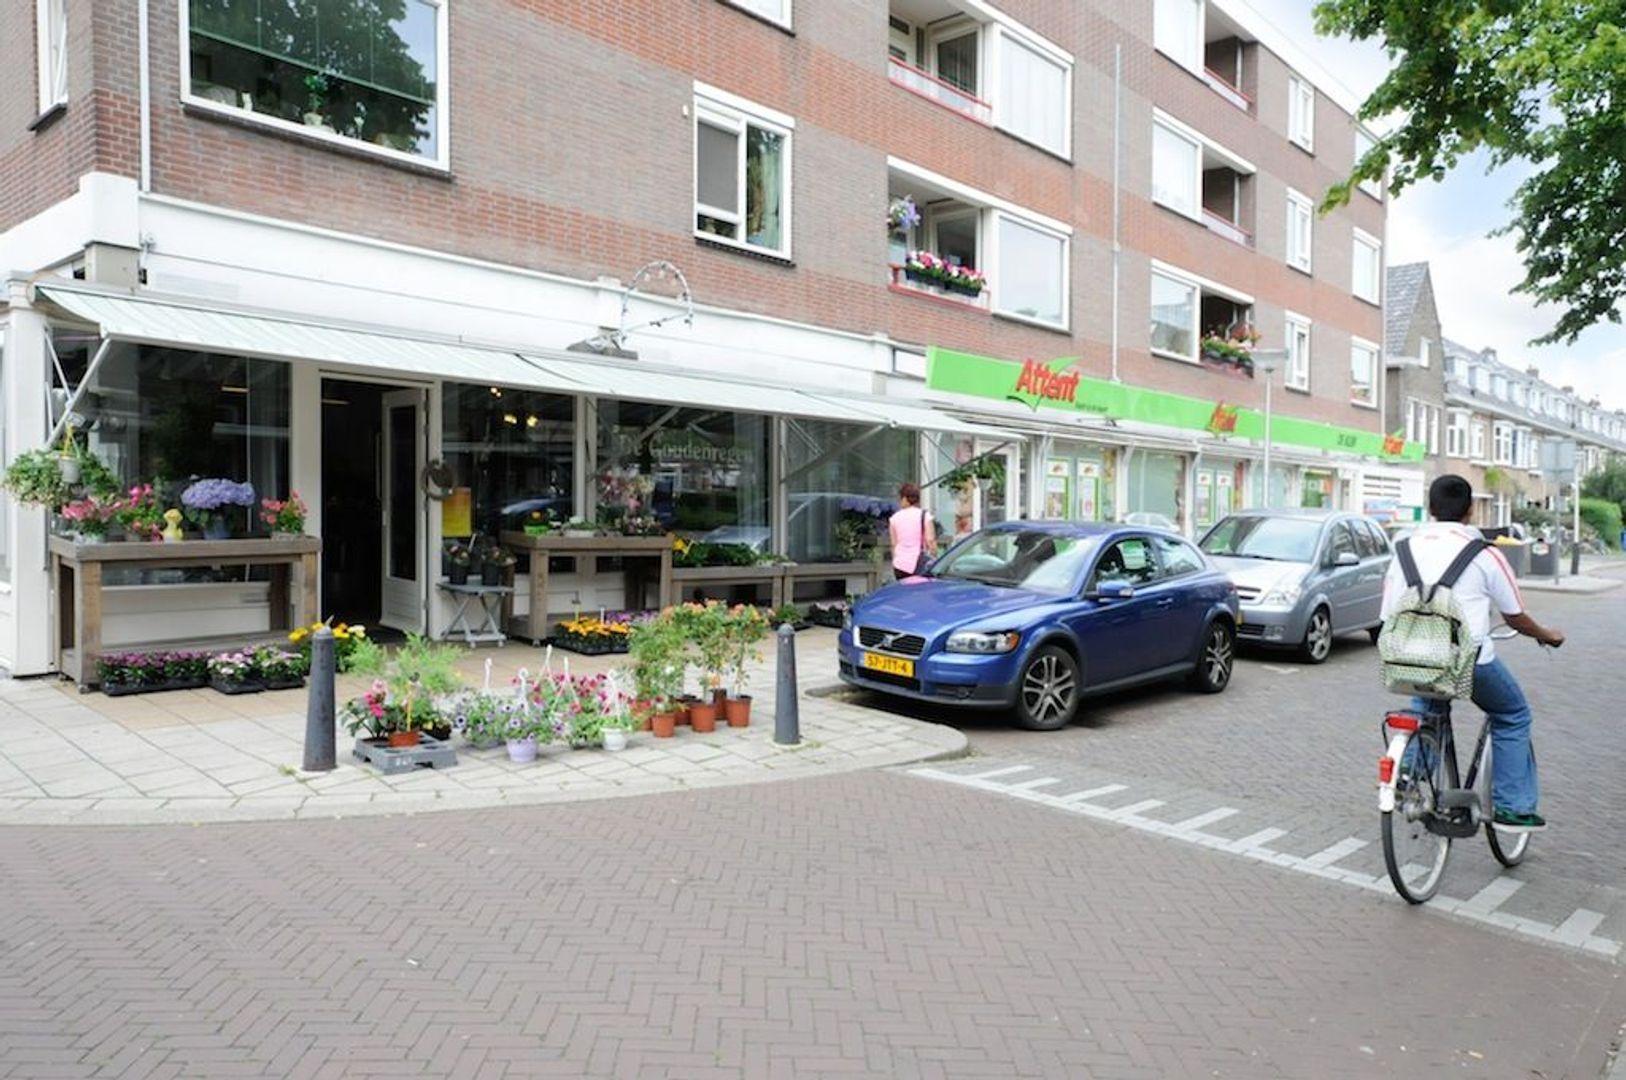 Celebesstraat 5, Delft foto-21